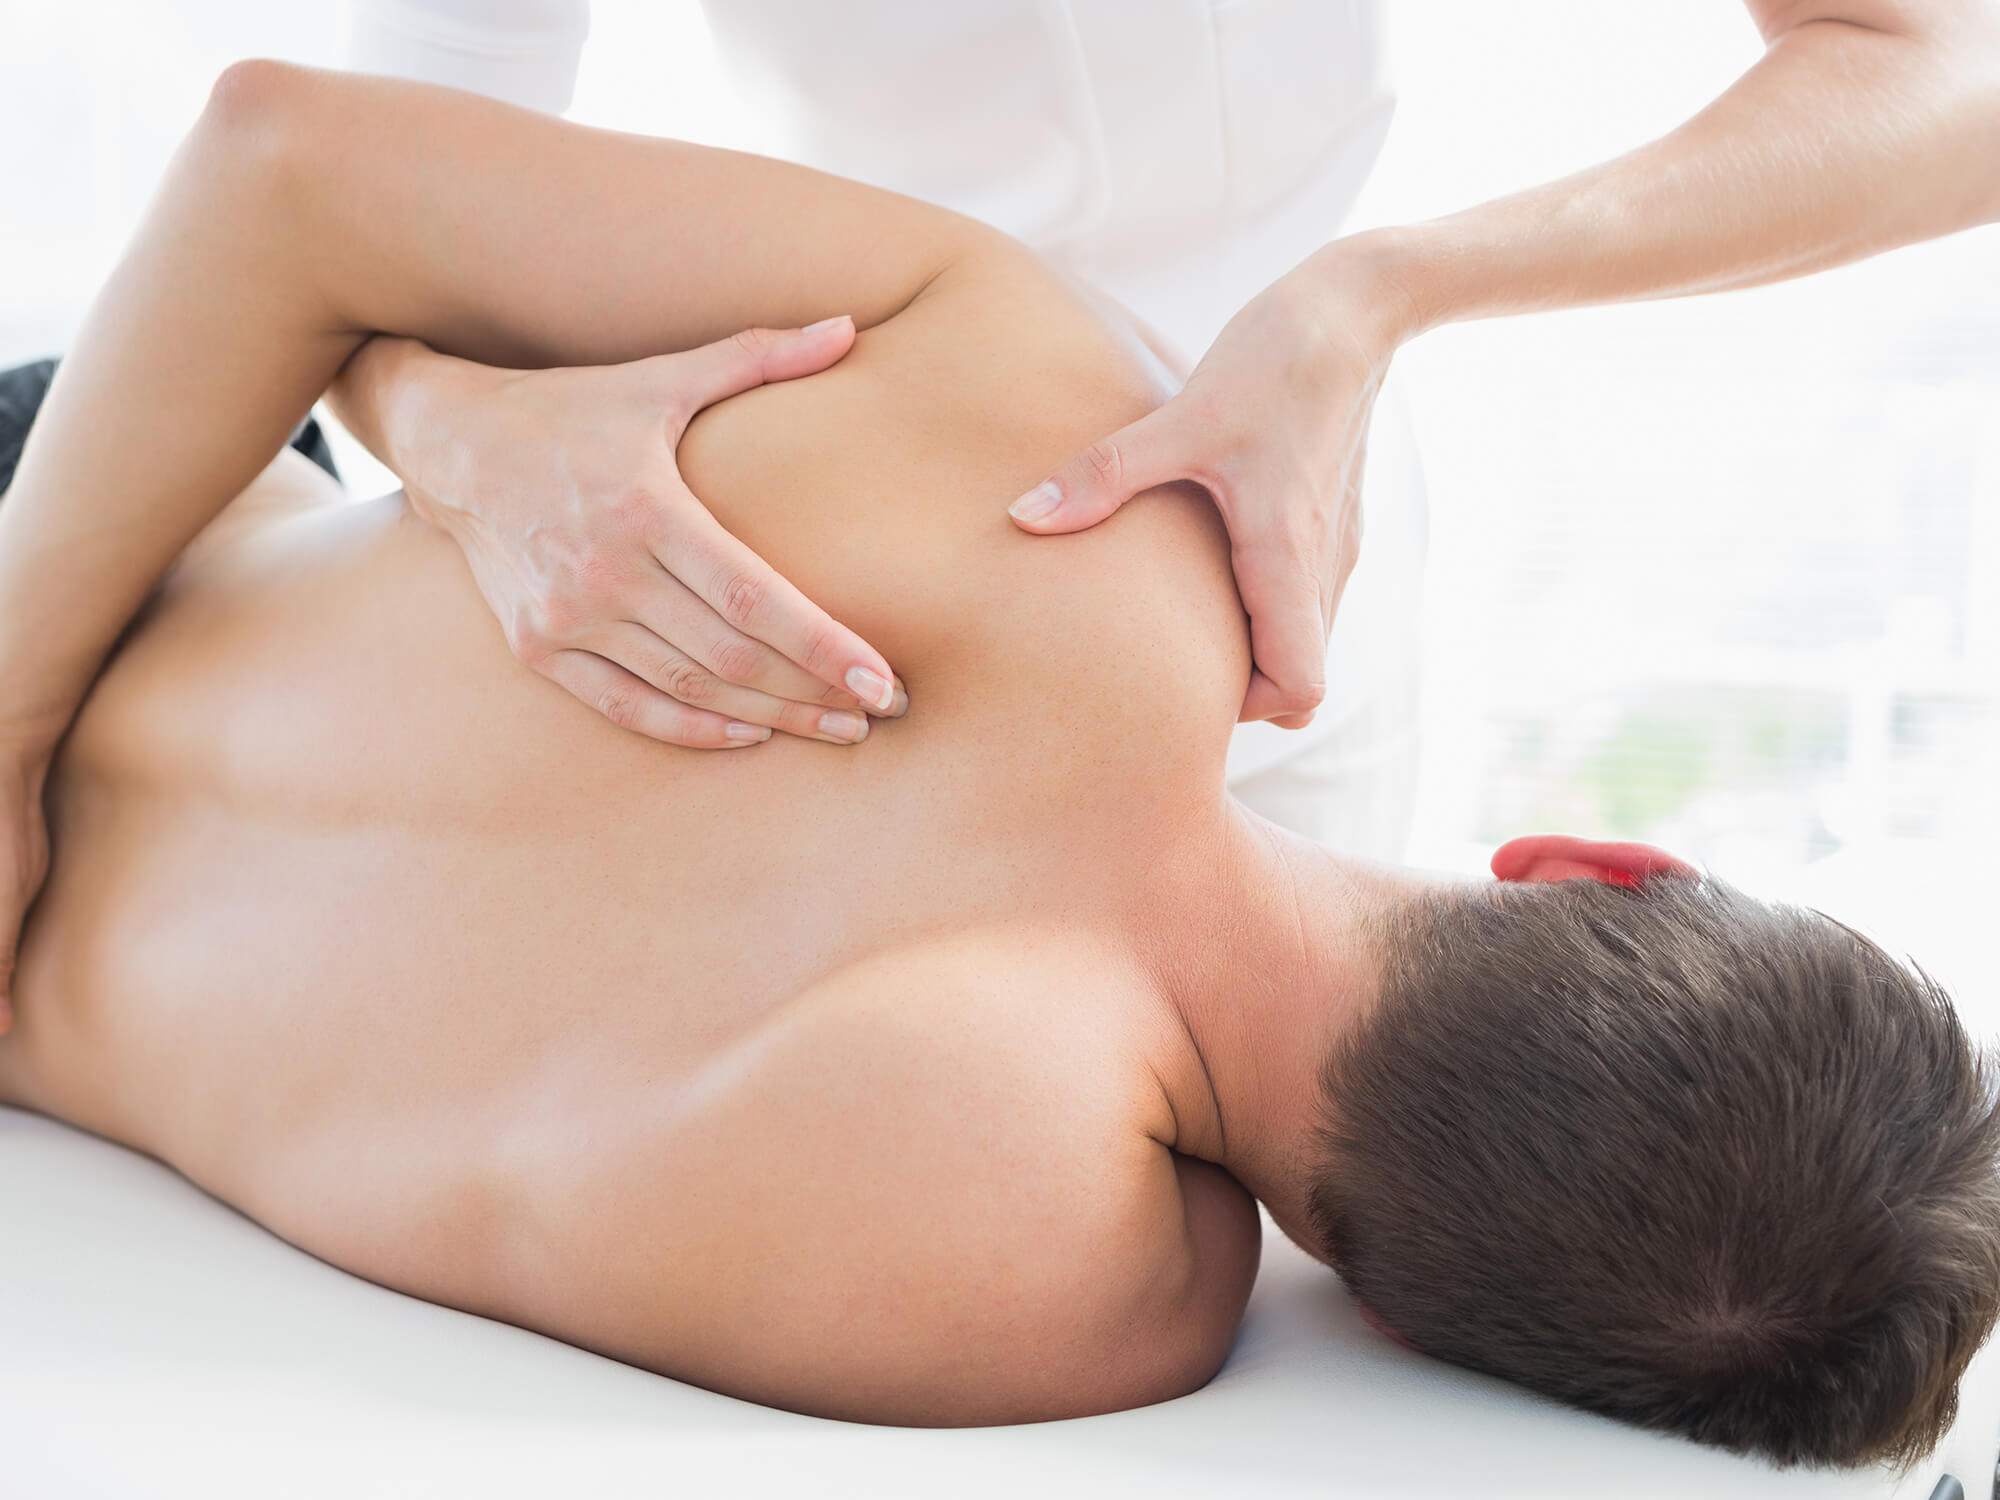 Schulterschmerzen: Ursachen, Symptome & Behandlung